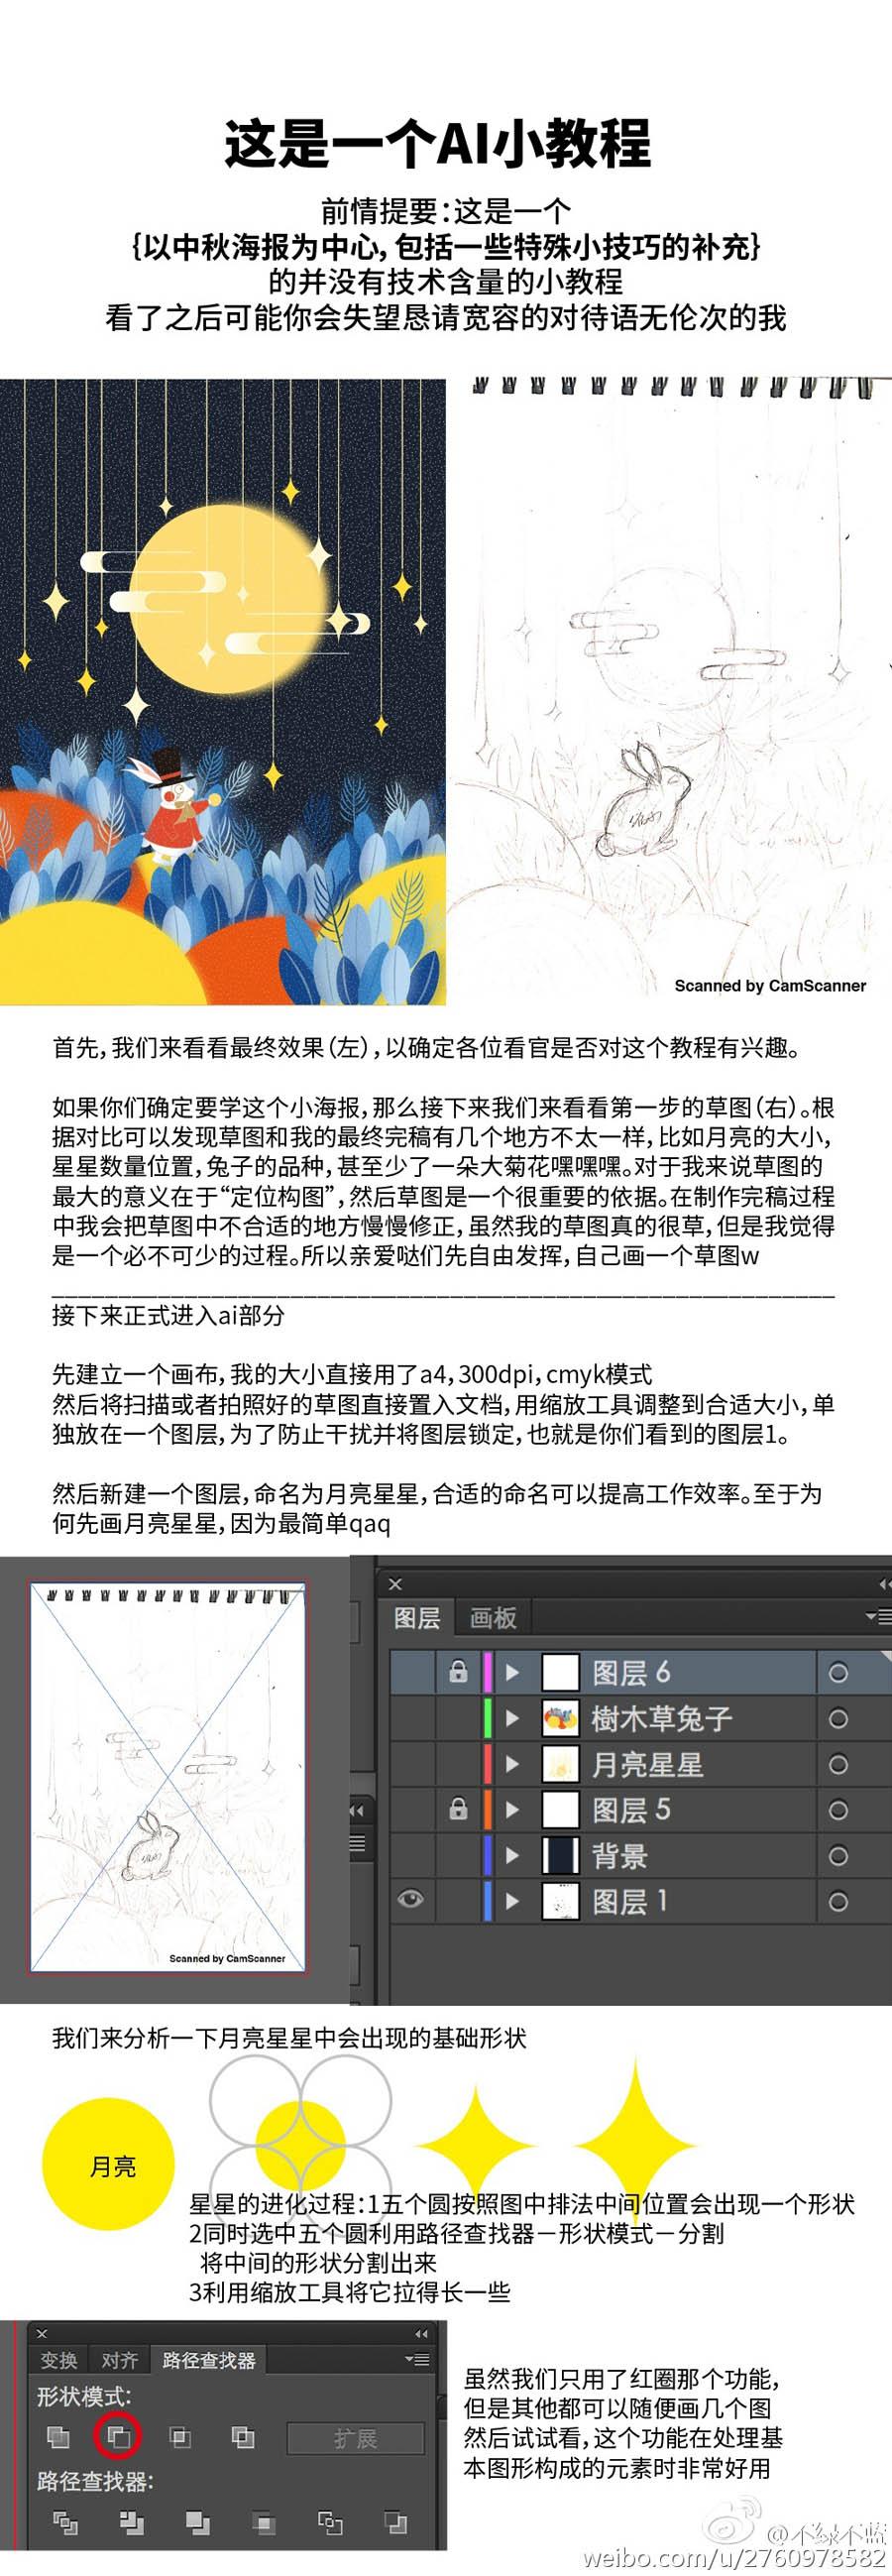 Illustrator绘制创意风格的童话场景海报,PS教程,思缘教程网